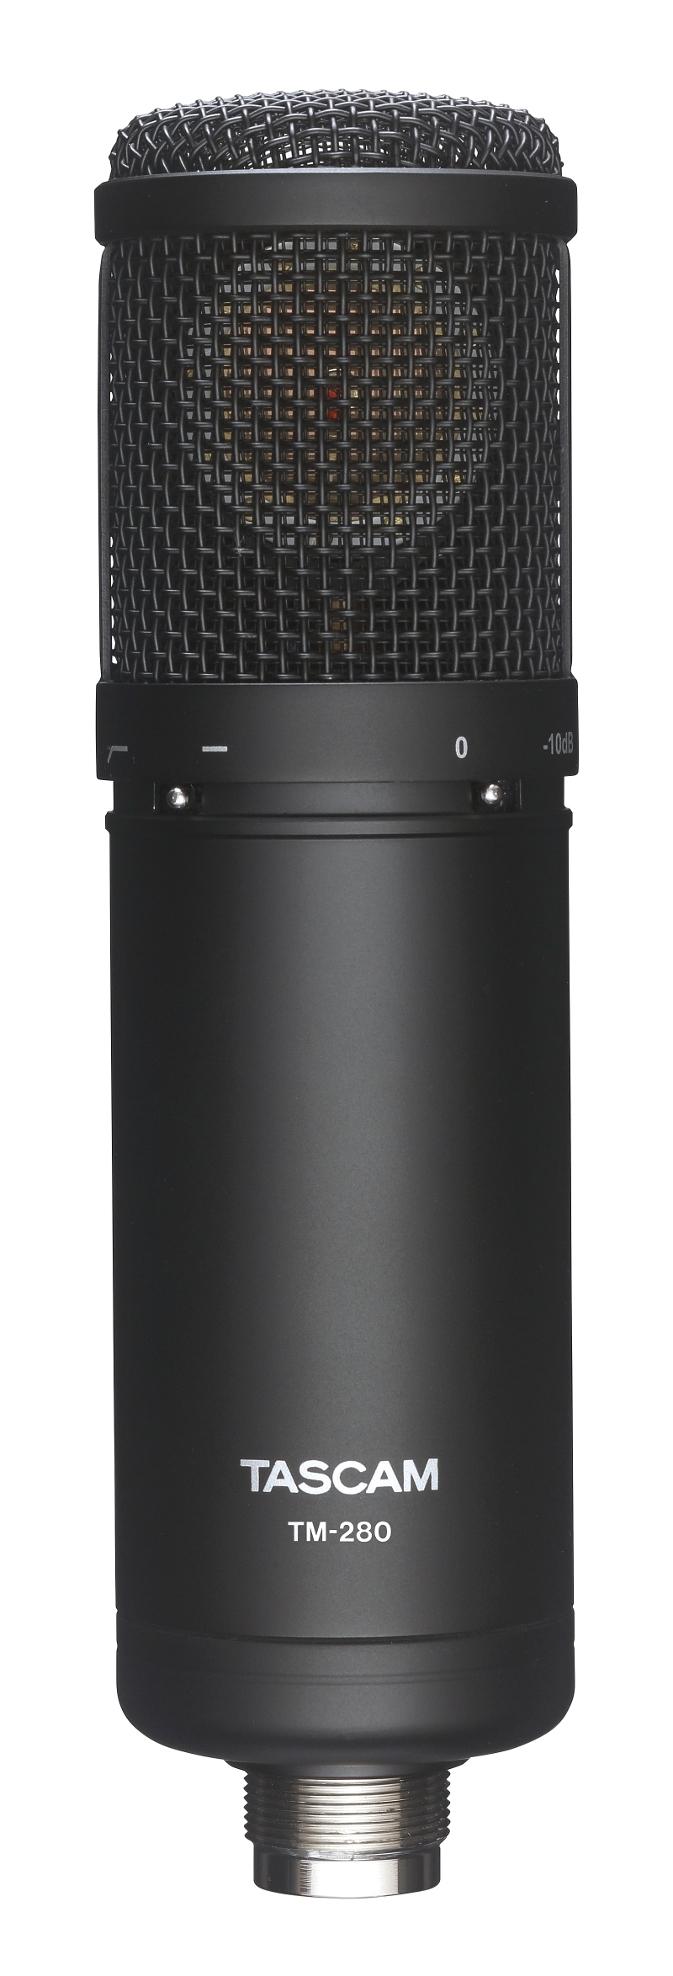 Tascam TM280 Condenser Microphone Instant Rebate